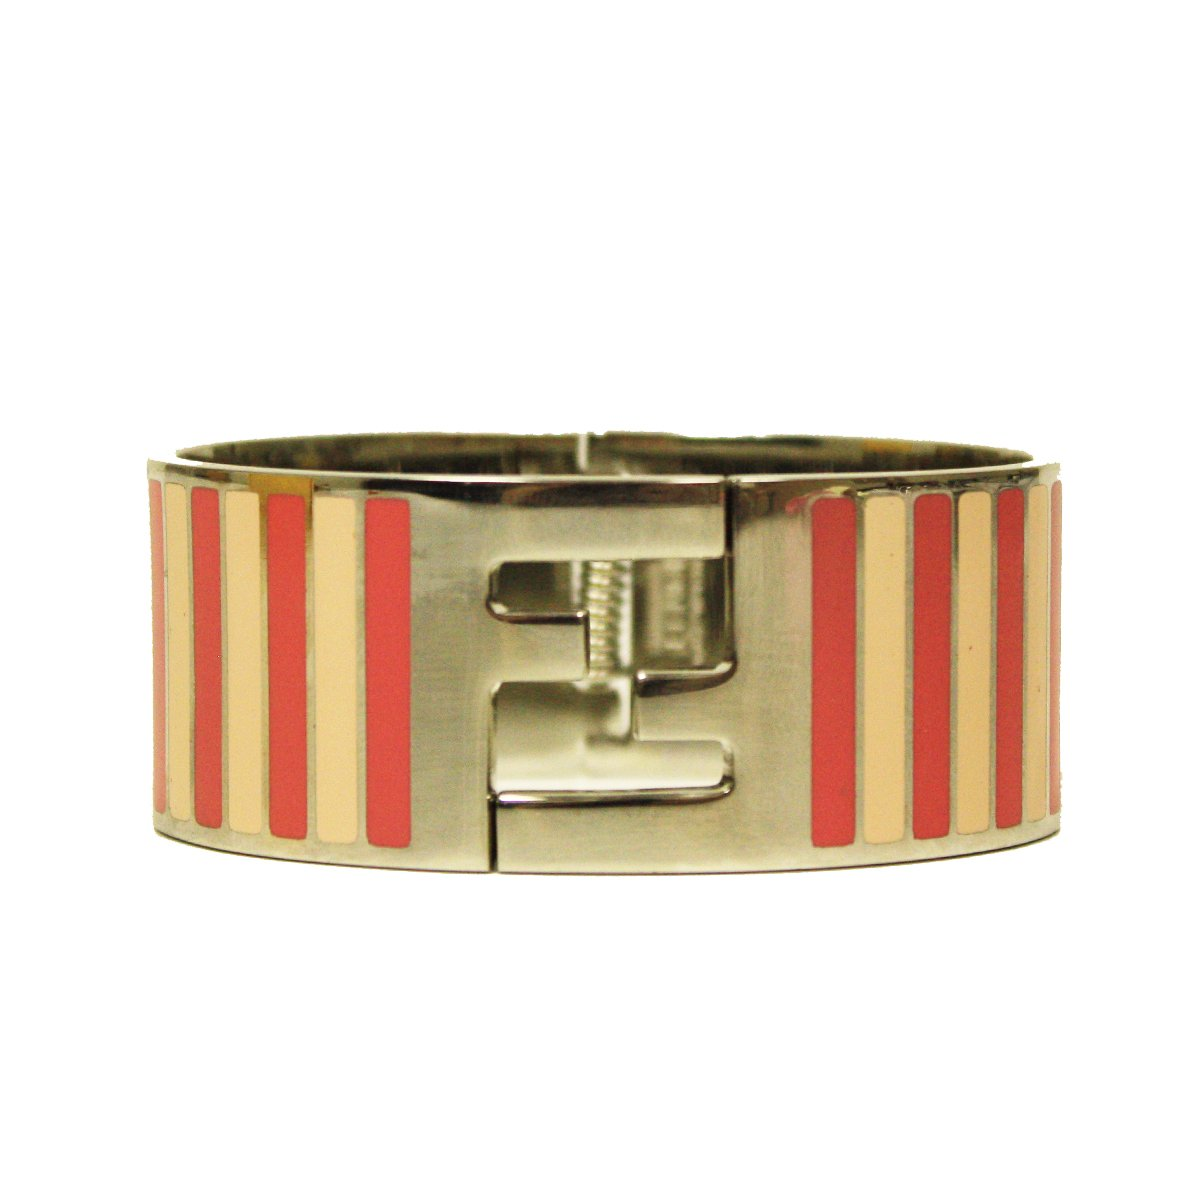 Fendi Silver Enamel Cuff with Pink Pequin Stripes Clic Clac Bracelet 8AG137 by Fendi